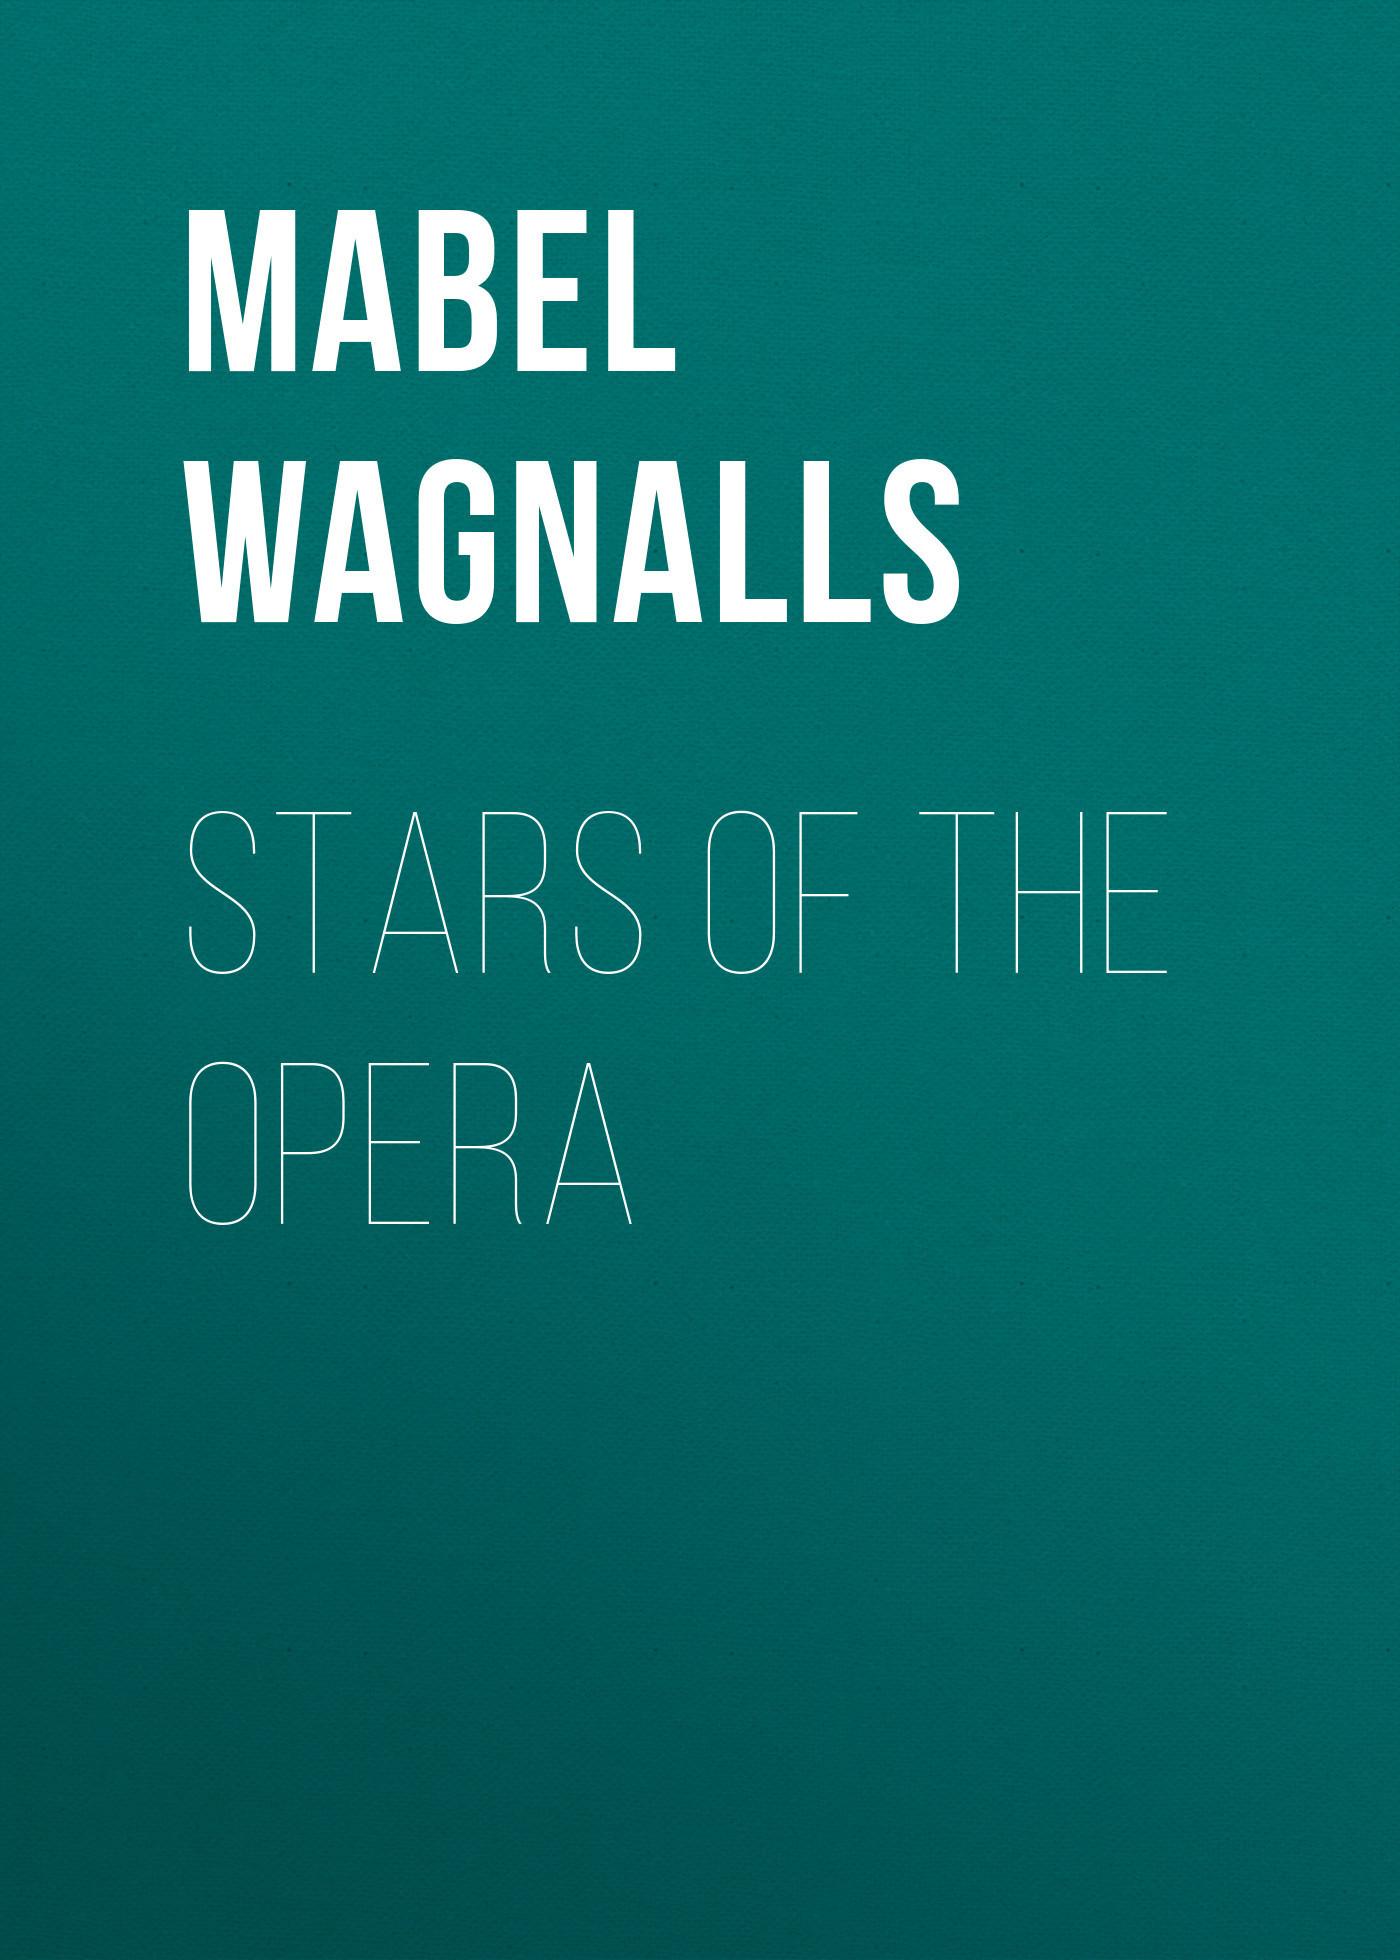 Stars of the Opera